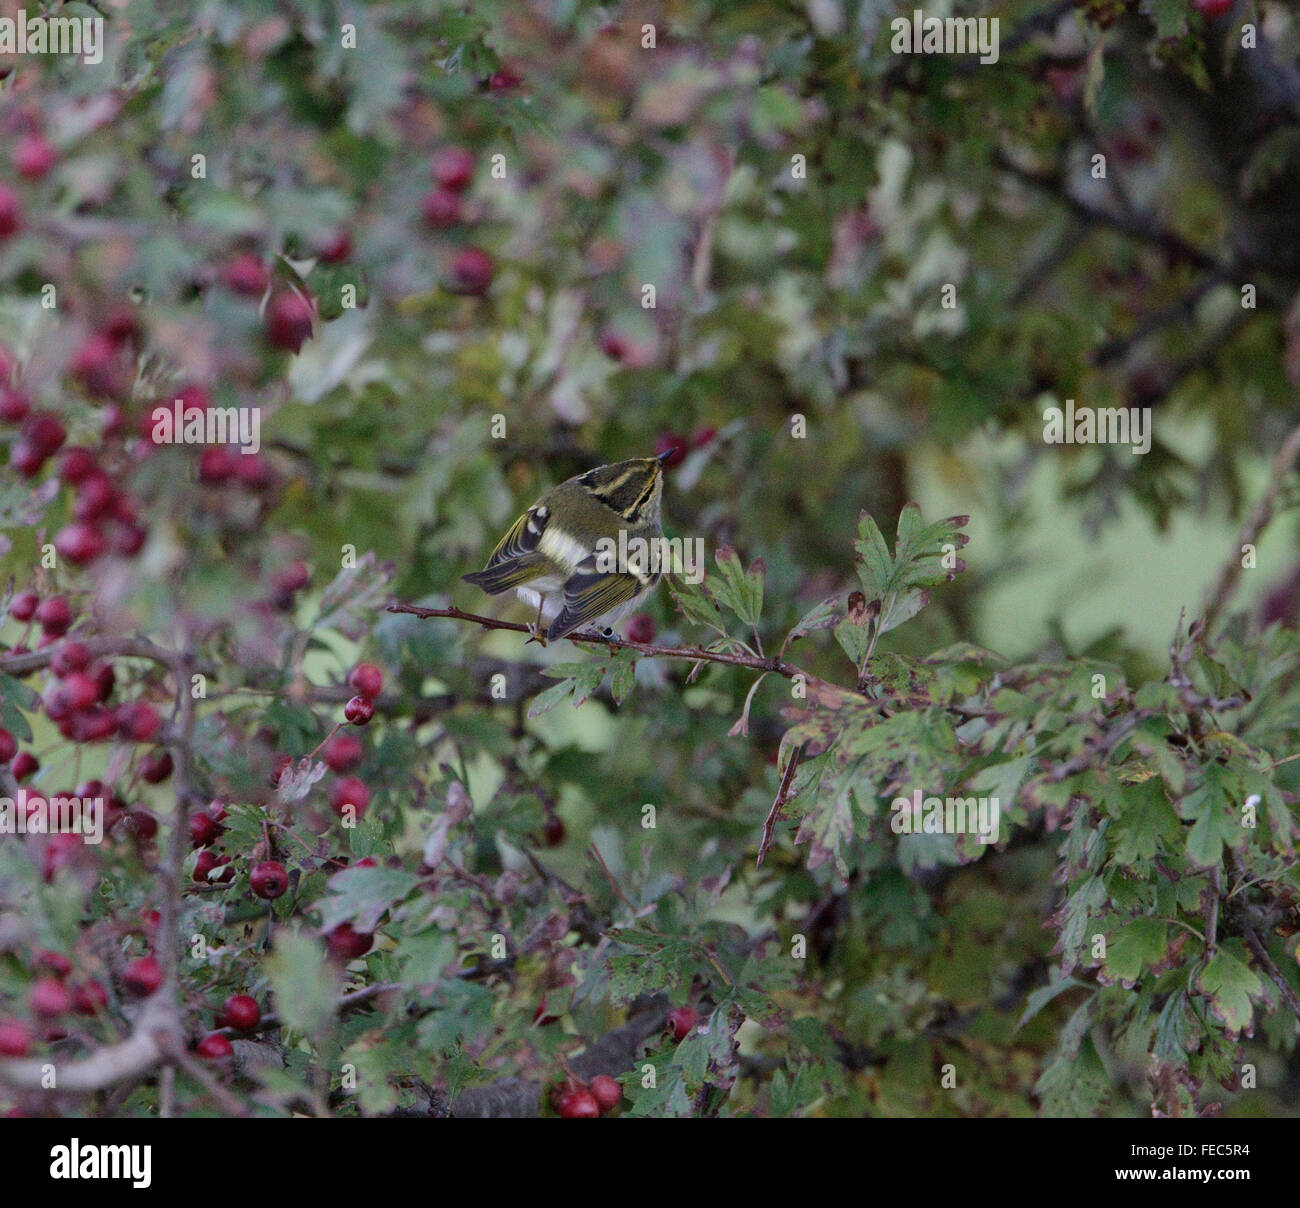 Pallas's Warbler, Phylloscopus, proregulus, Stock Photo